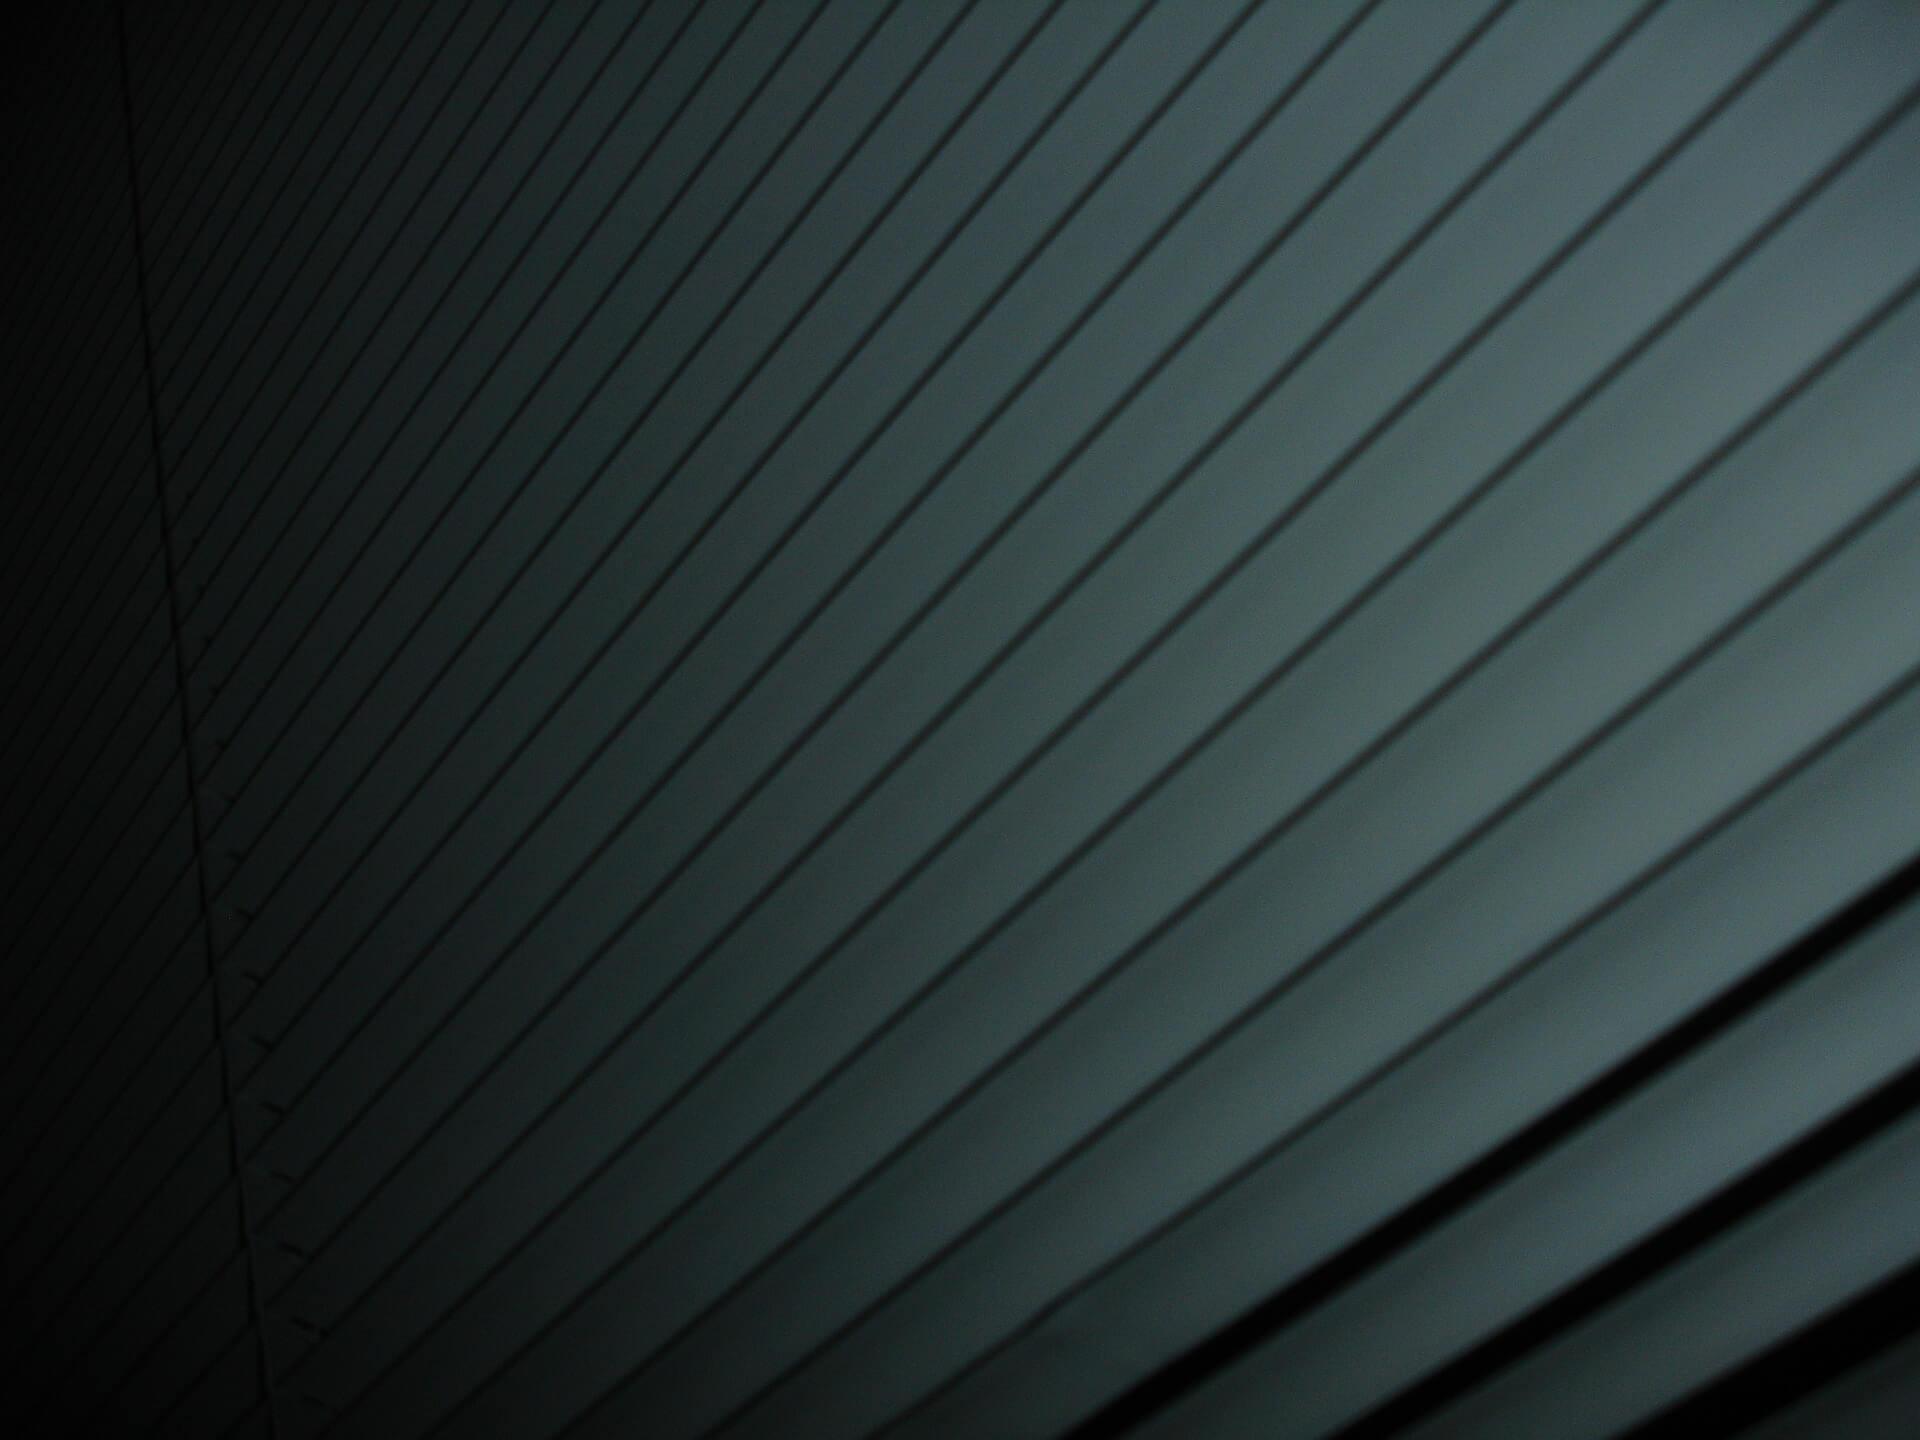 okna pcv piotrków trybunalski